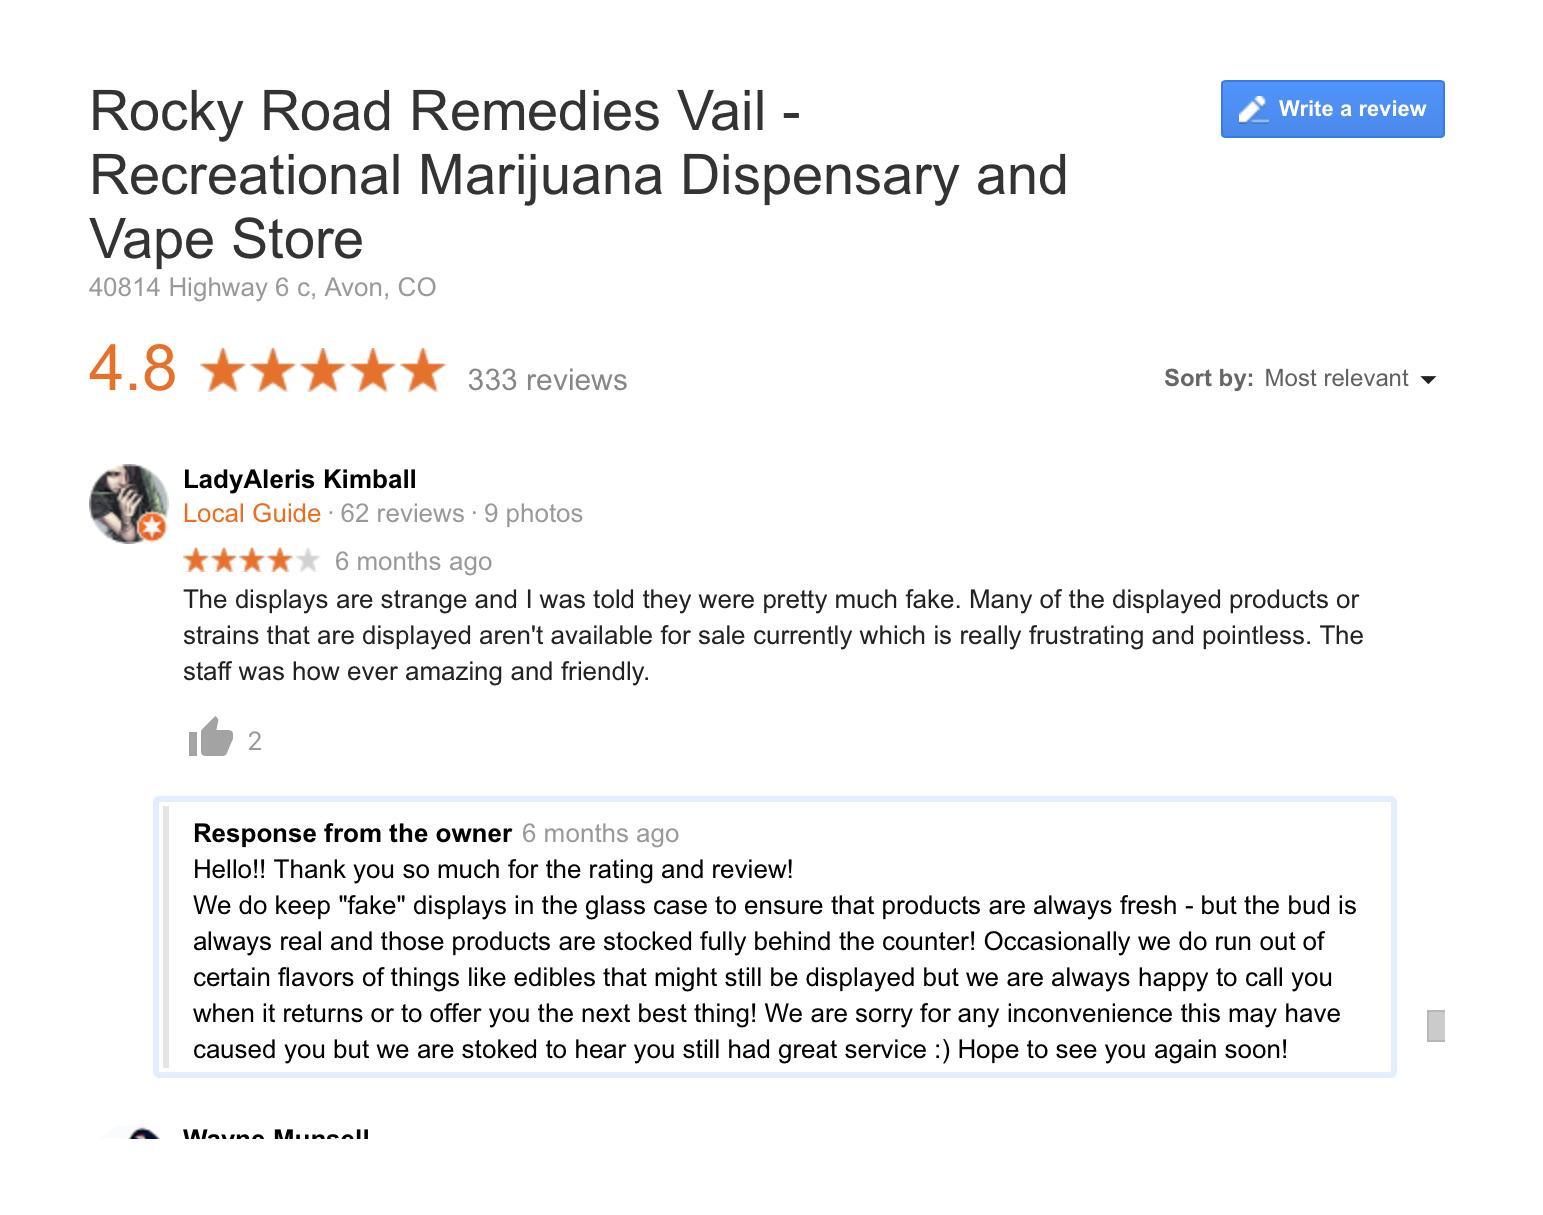 Dispensary marketing Reputation management for marijuana and cbd companies.